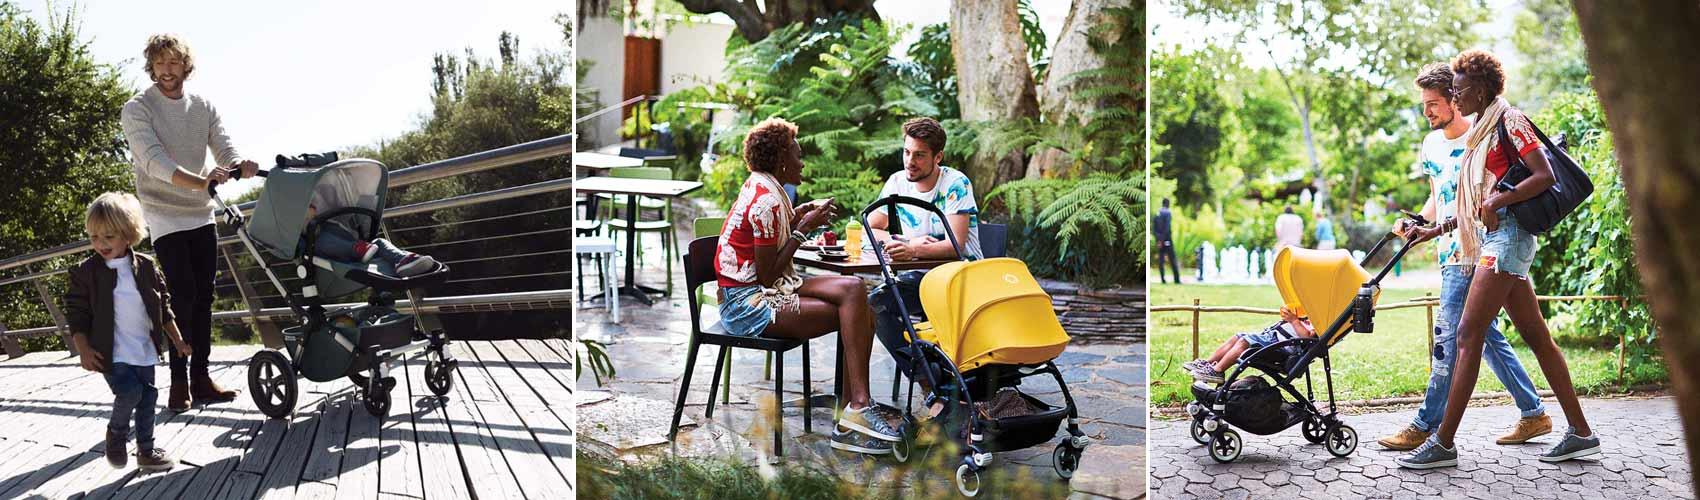 Bugaboo passeggino vendita on line - Bimbi Megastore negozio prima infanzia